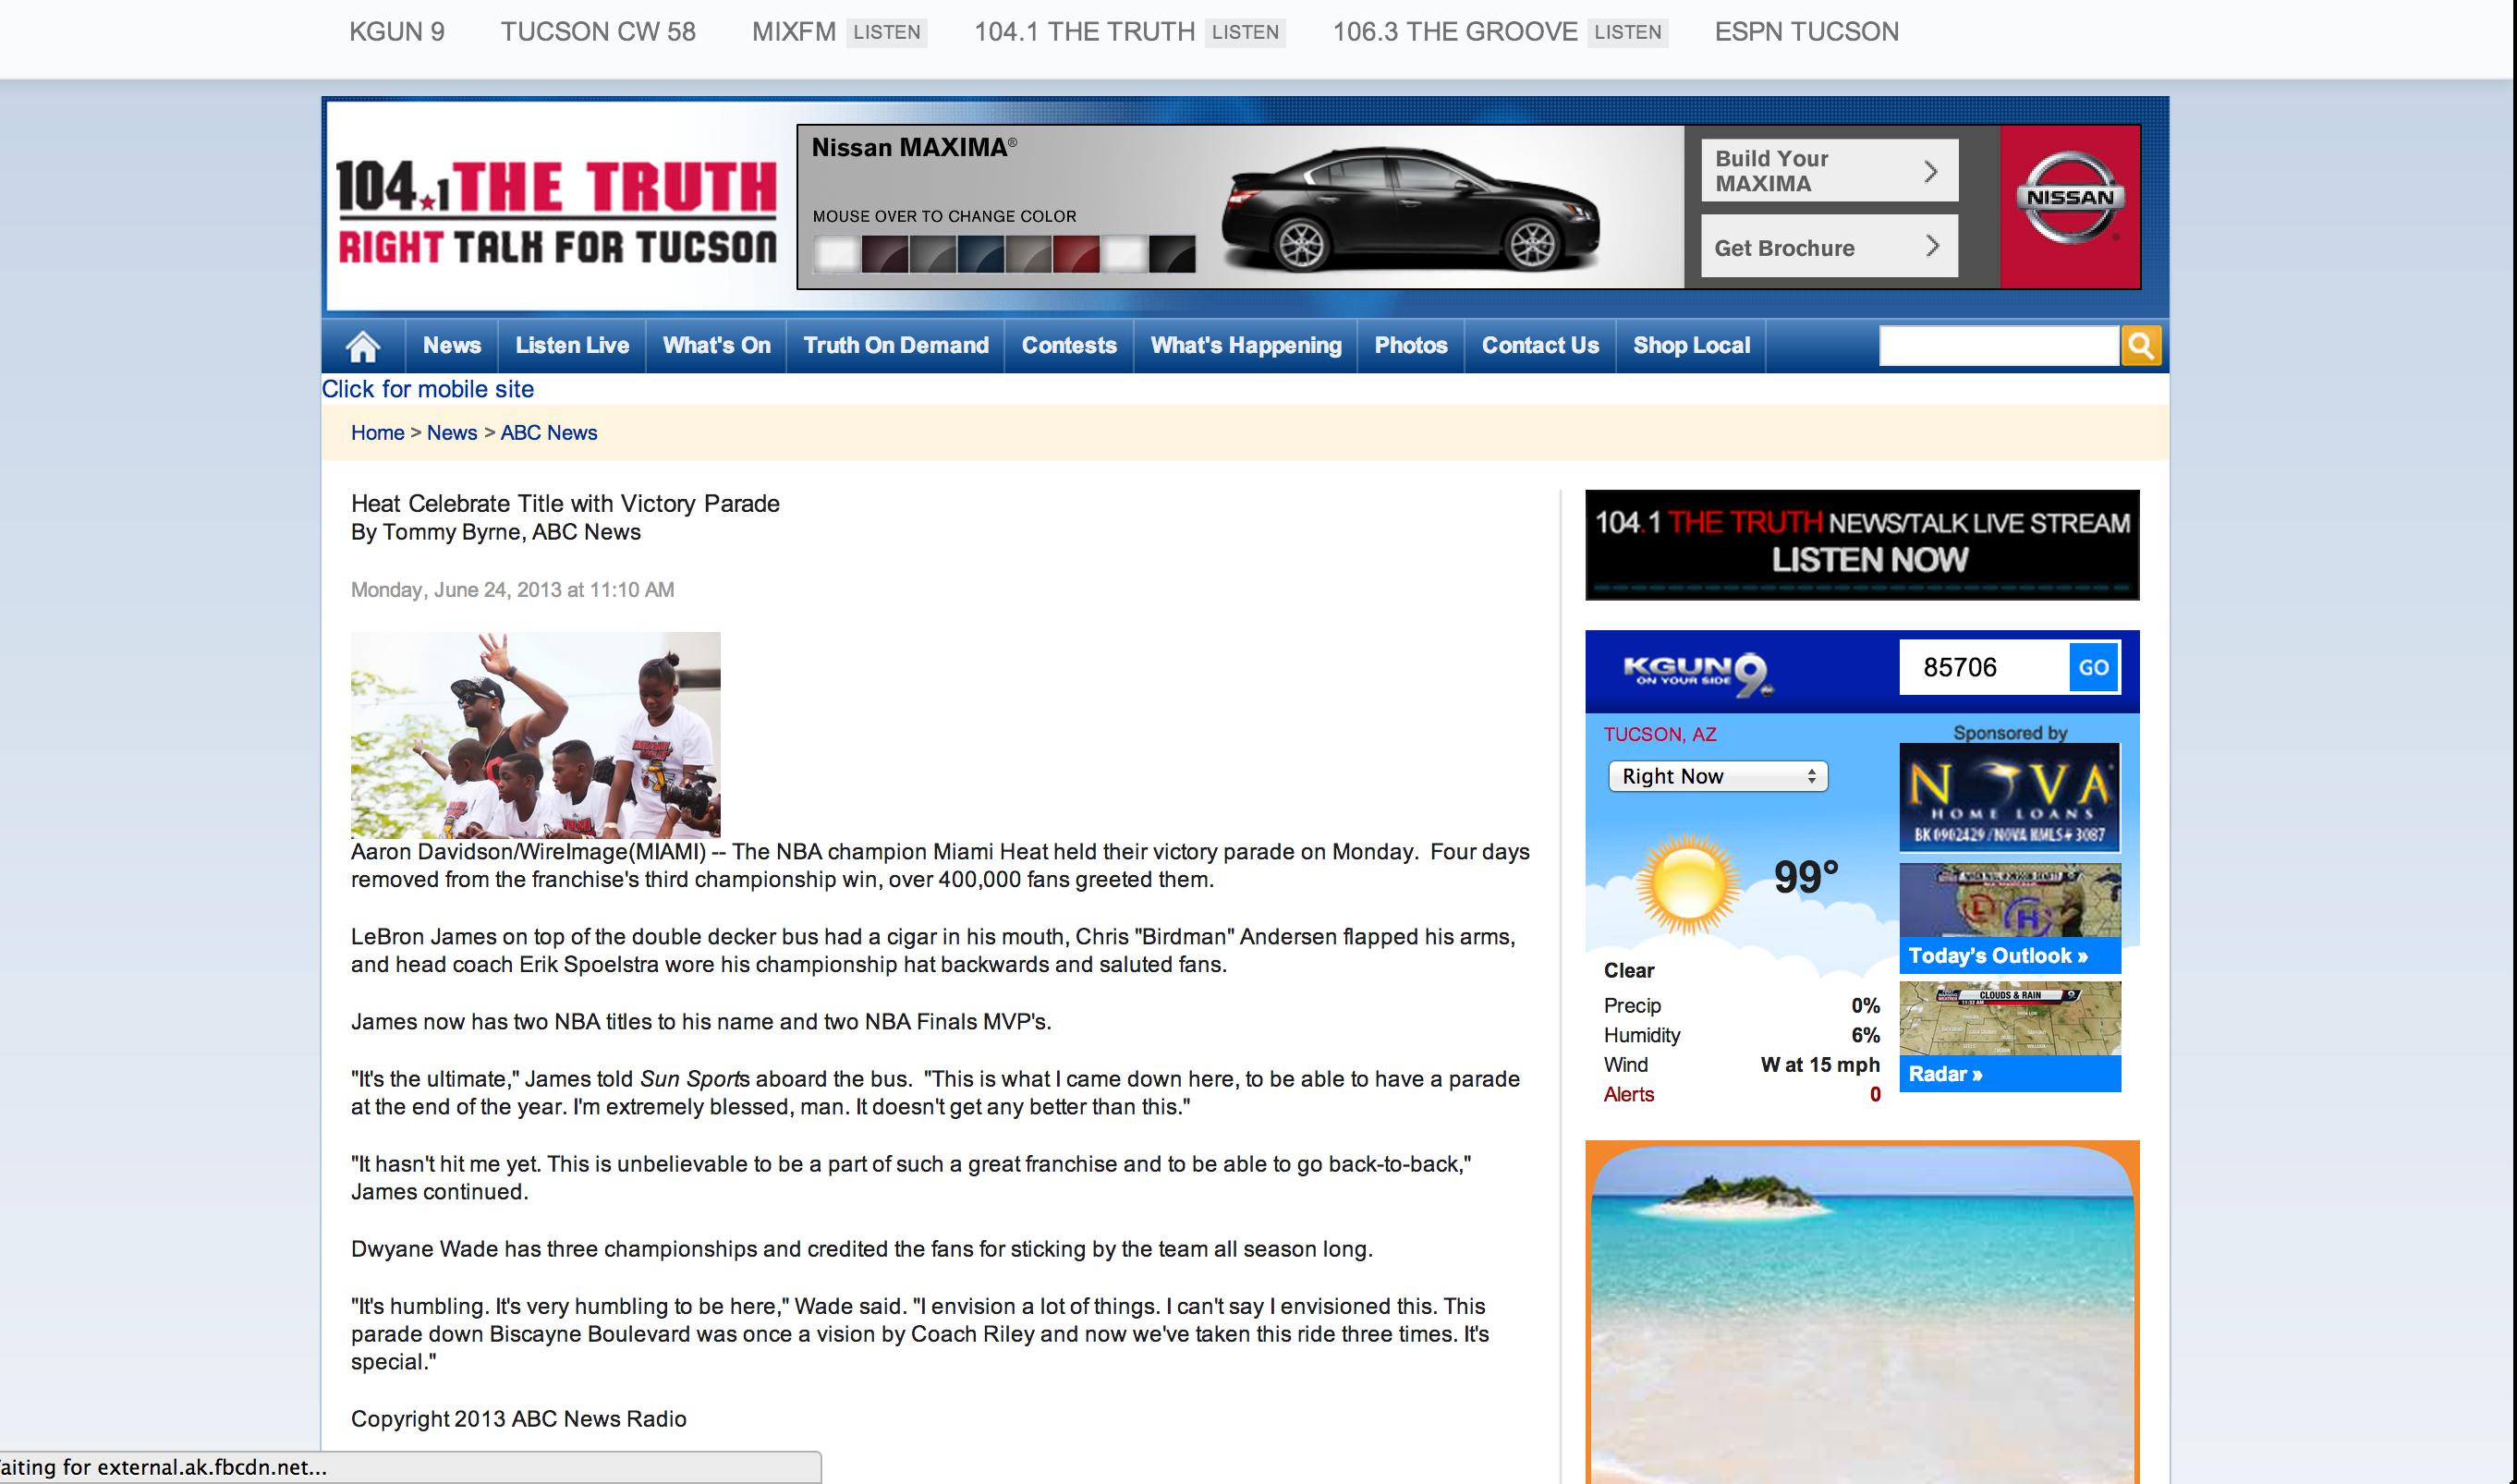 Dwayne Wade on Easy Idaho News